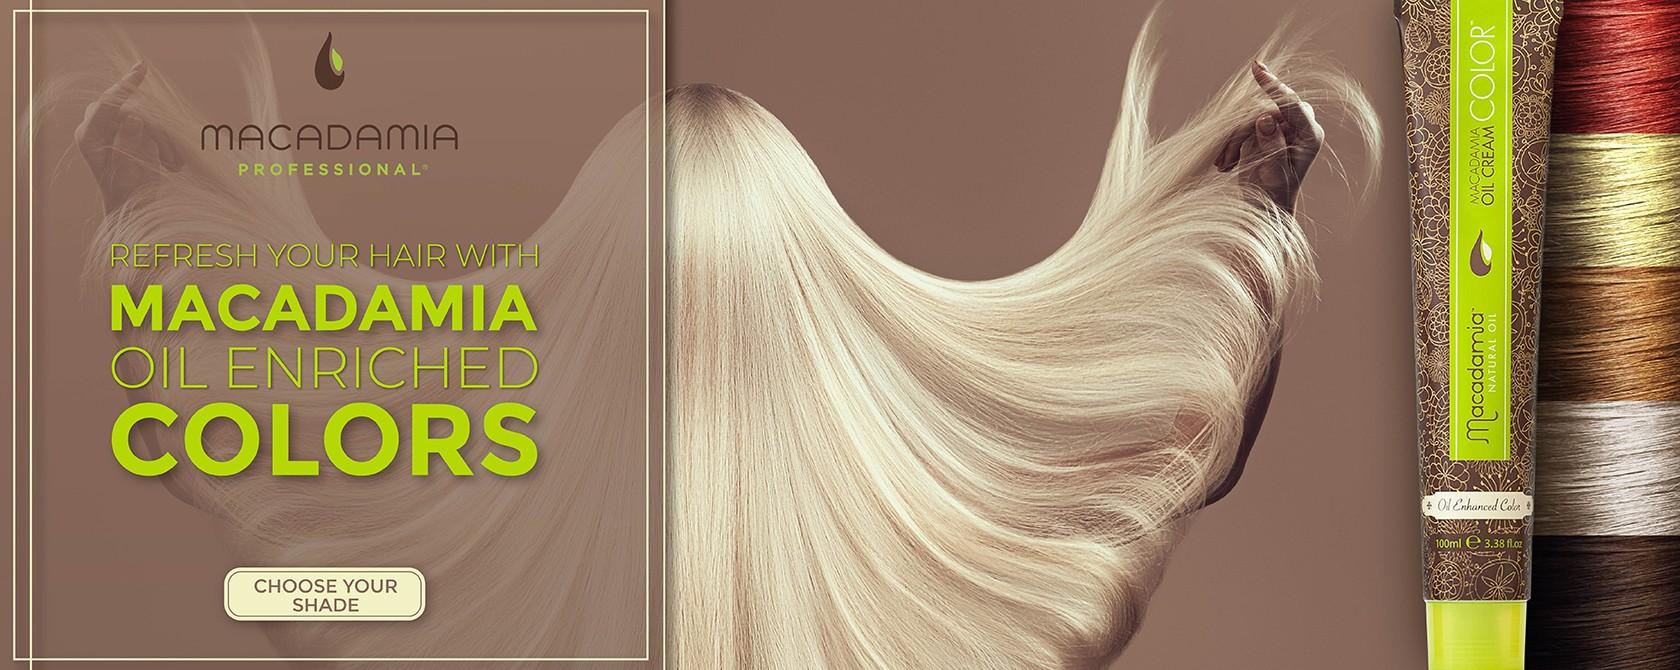 Macadamia hair colors